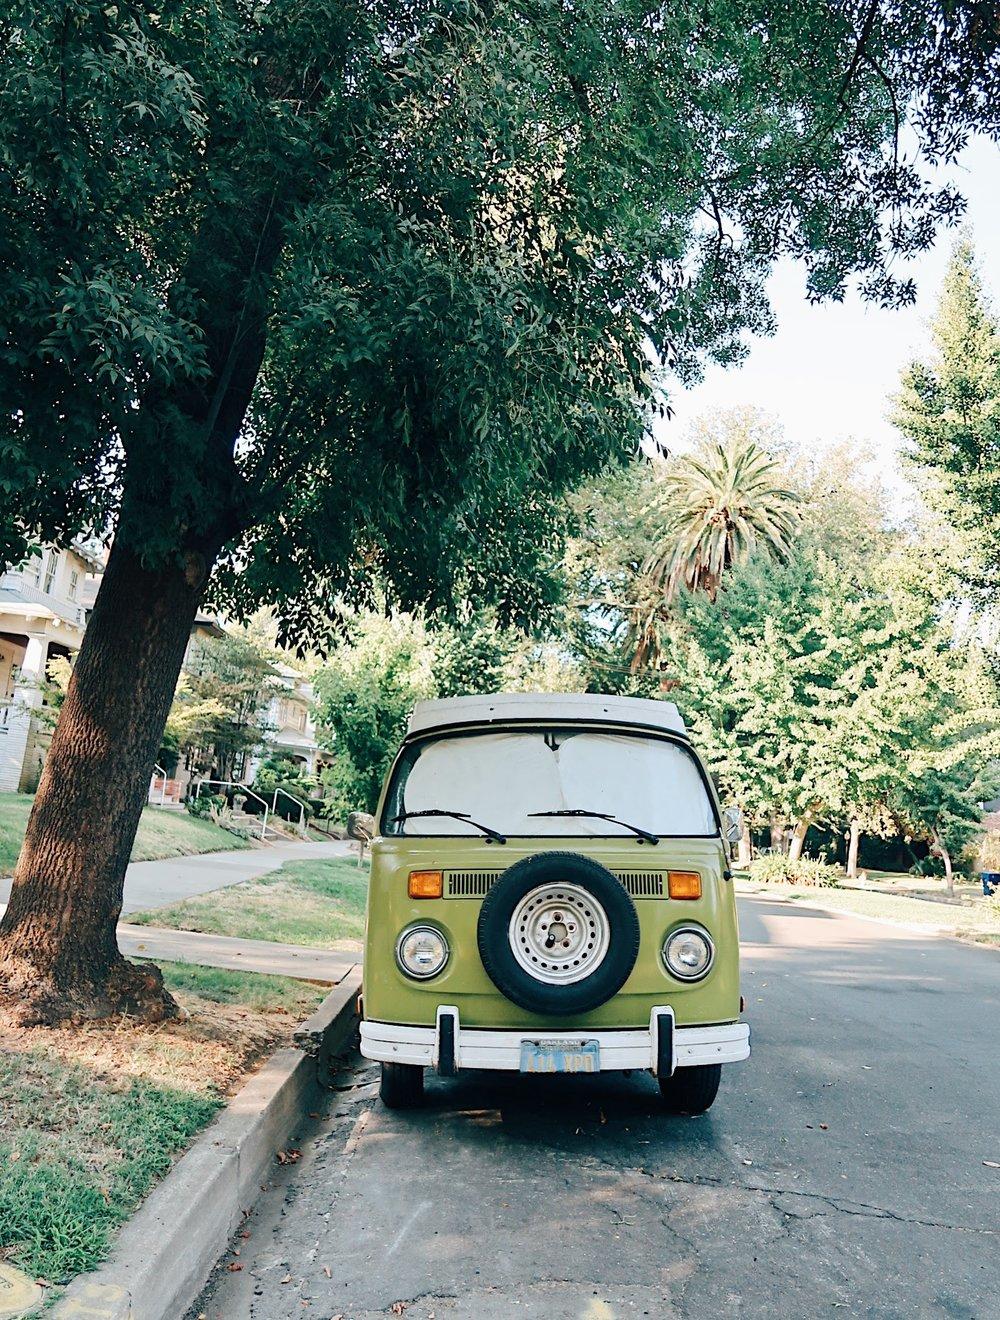 cars of midtown, a vw bus (brandon calls it a deadhead van) that hangs out in boulevard park in sacramento